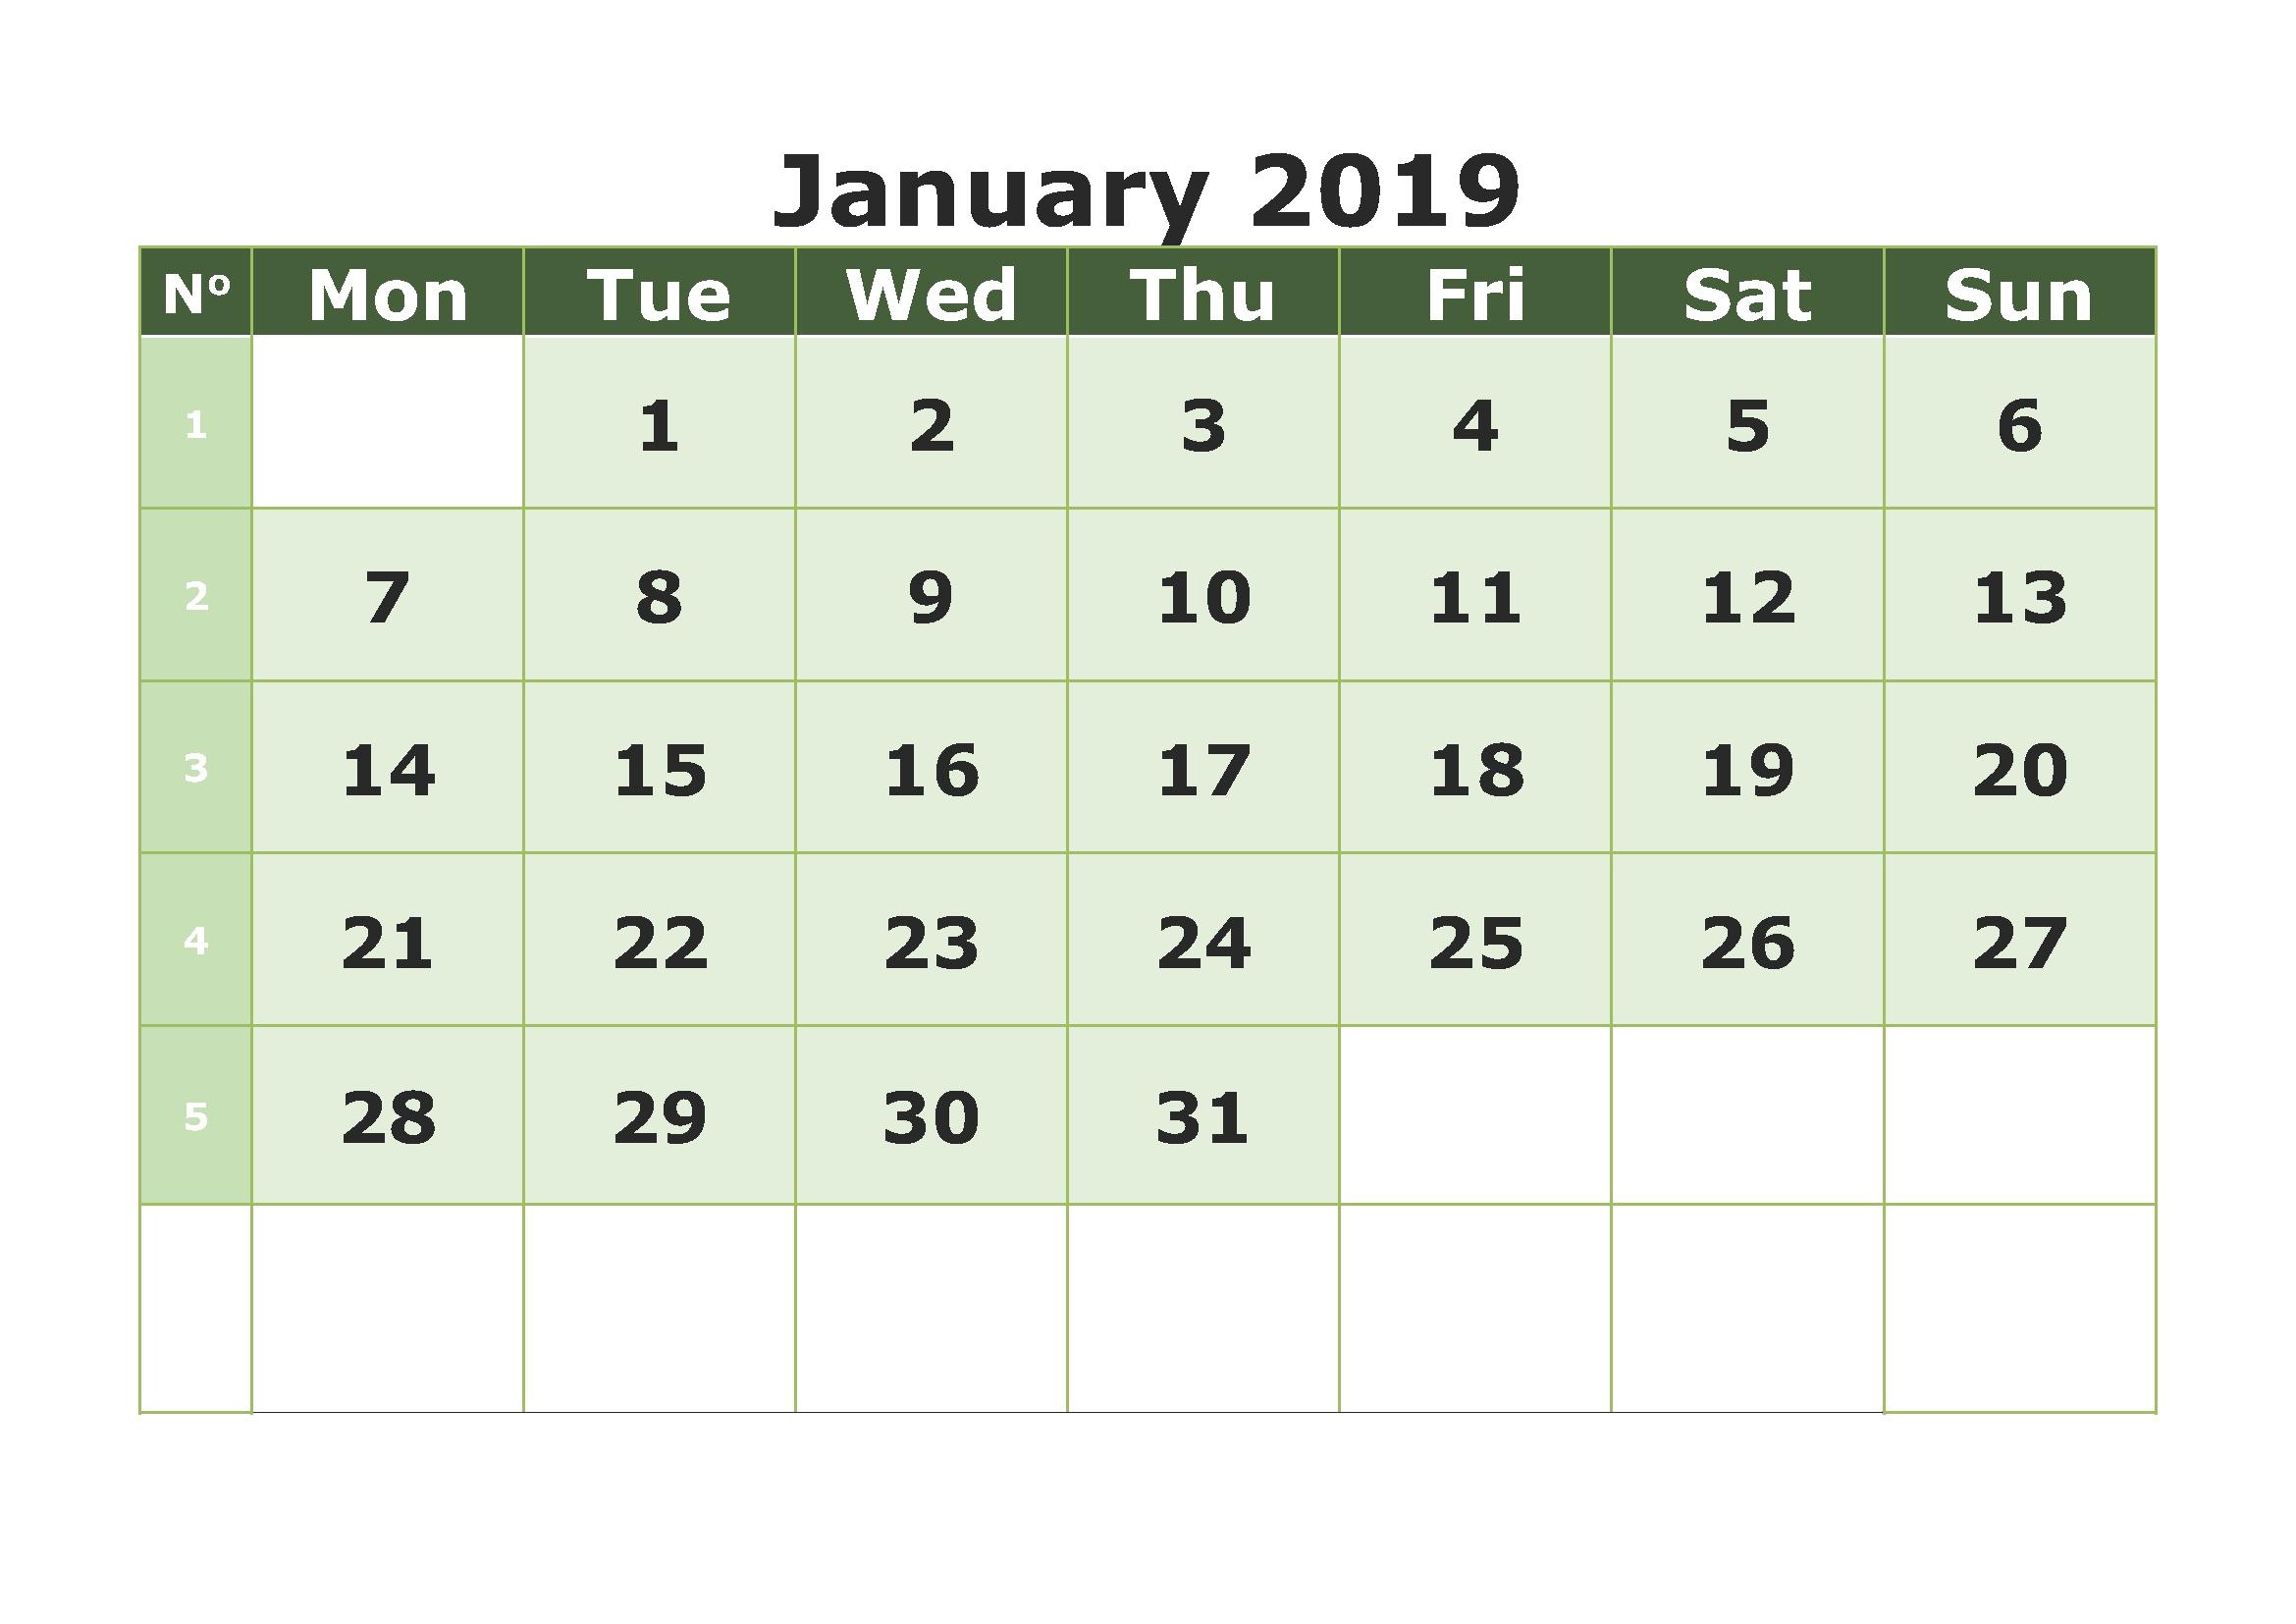 january 2019 calendar download january calendar january 2019::January 2019 Monthly Calendar